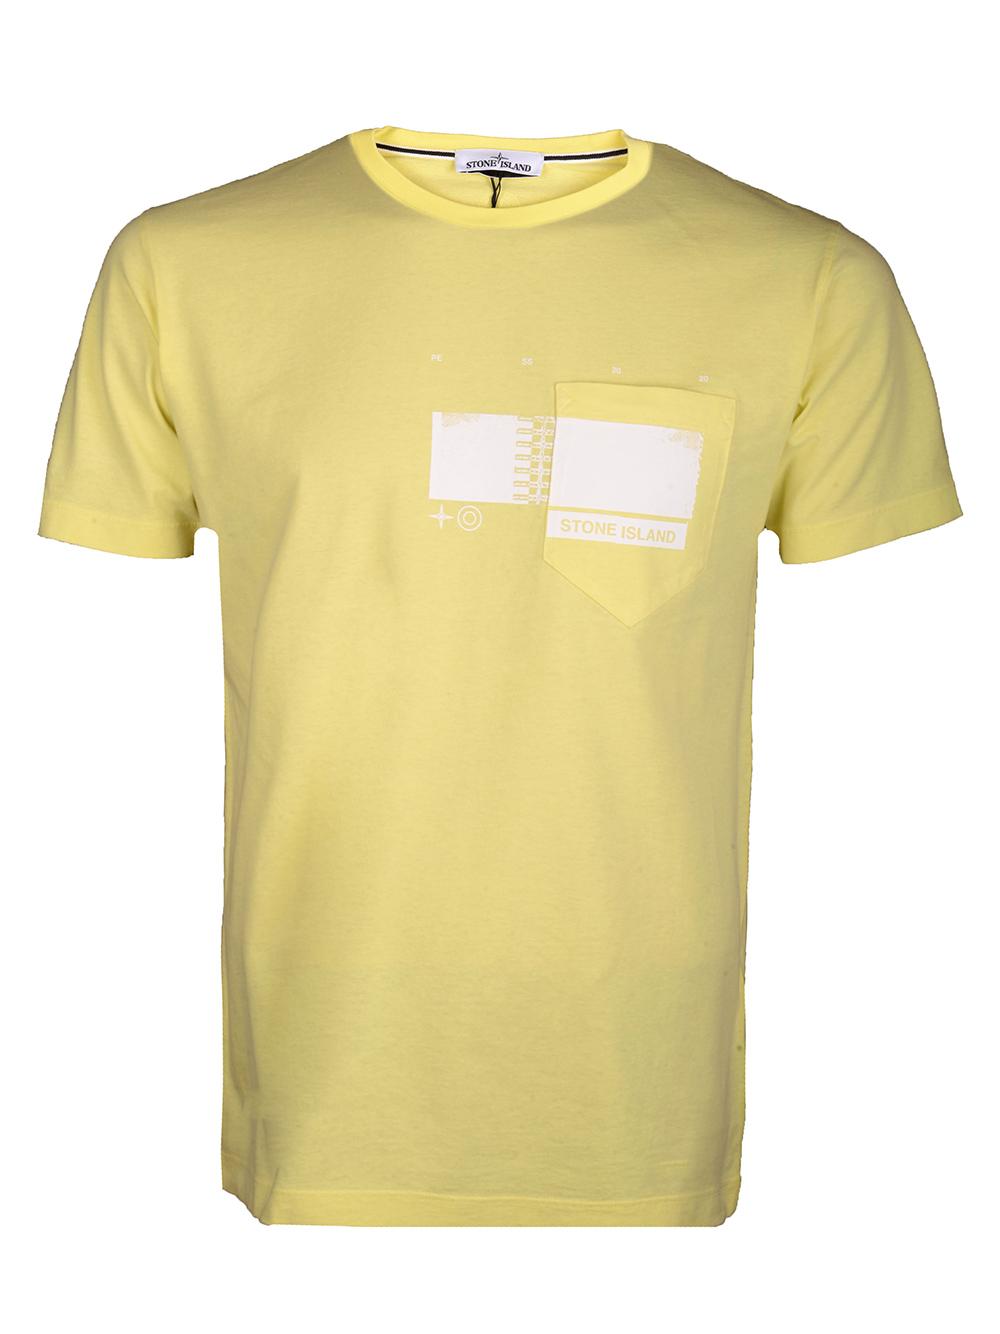 STONE ISLAND Μπλούζα T-Shirt MO721524685-V0031 ΚΙΤΡΙΝΟ